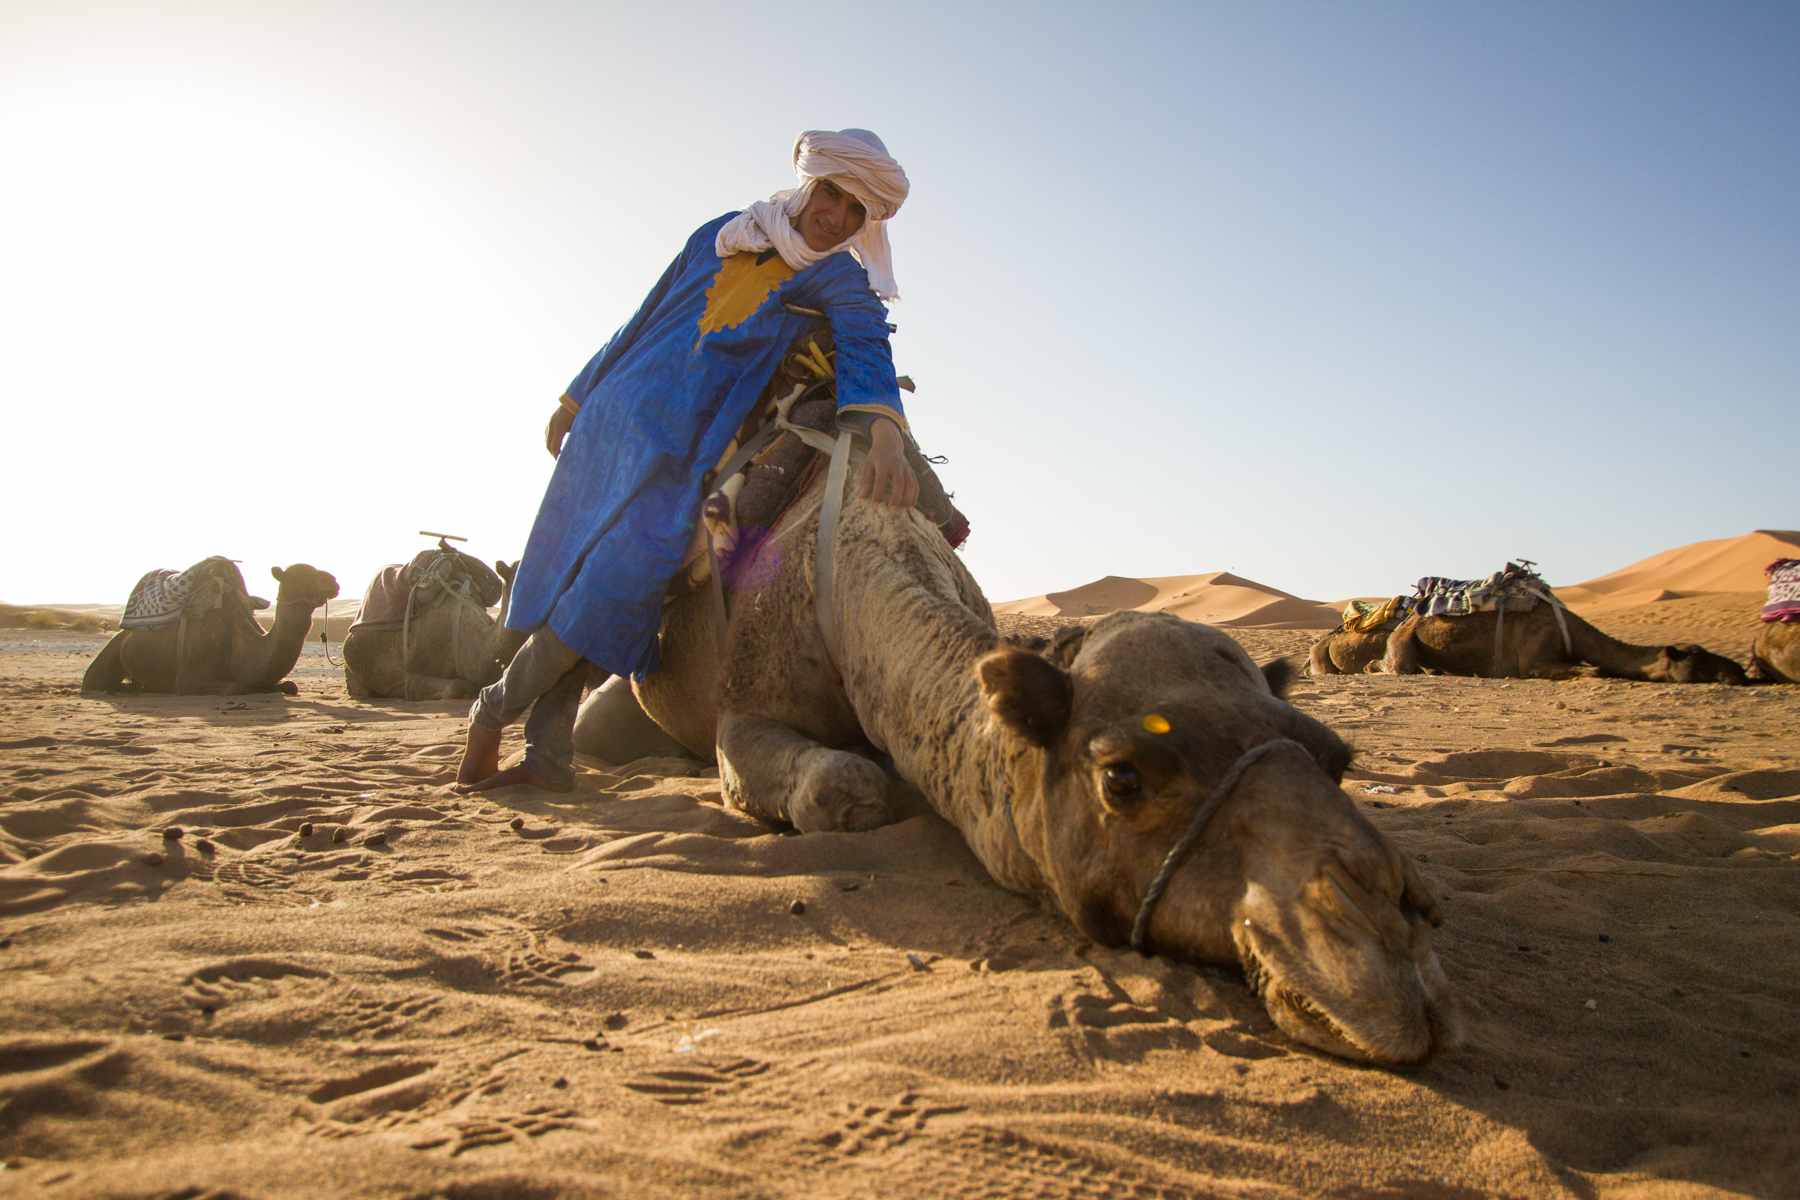 Eskogg_Morocco-33.jpg